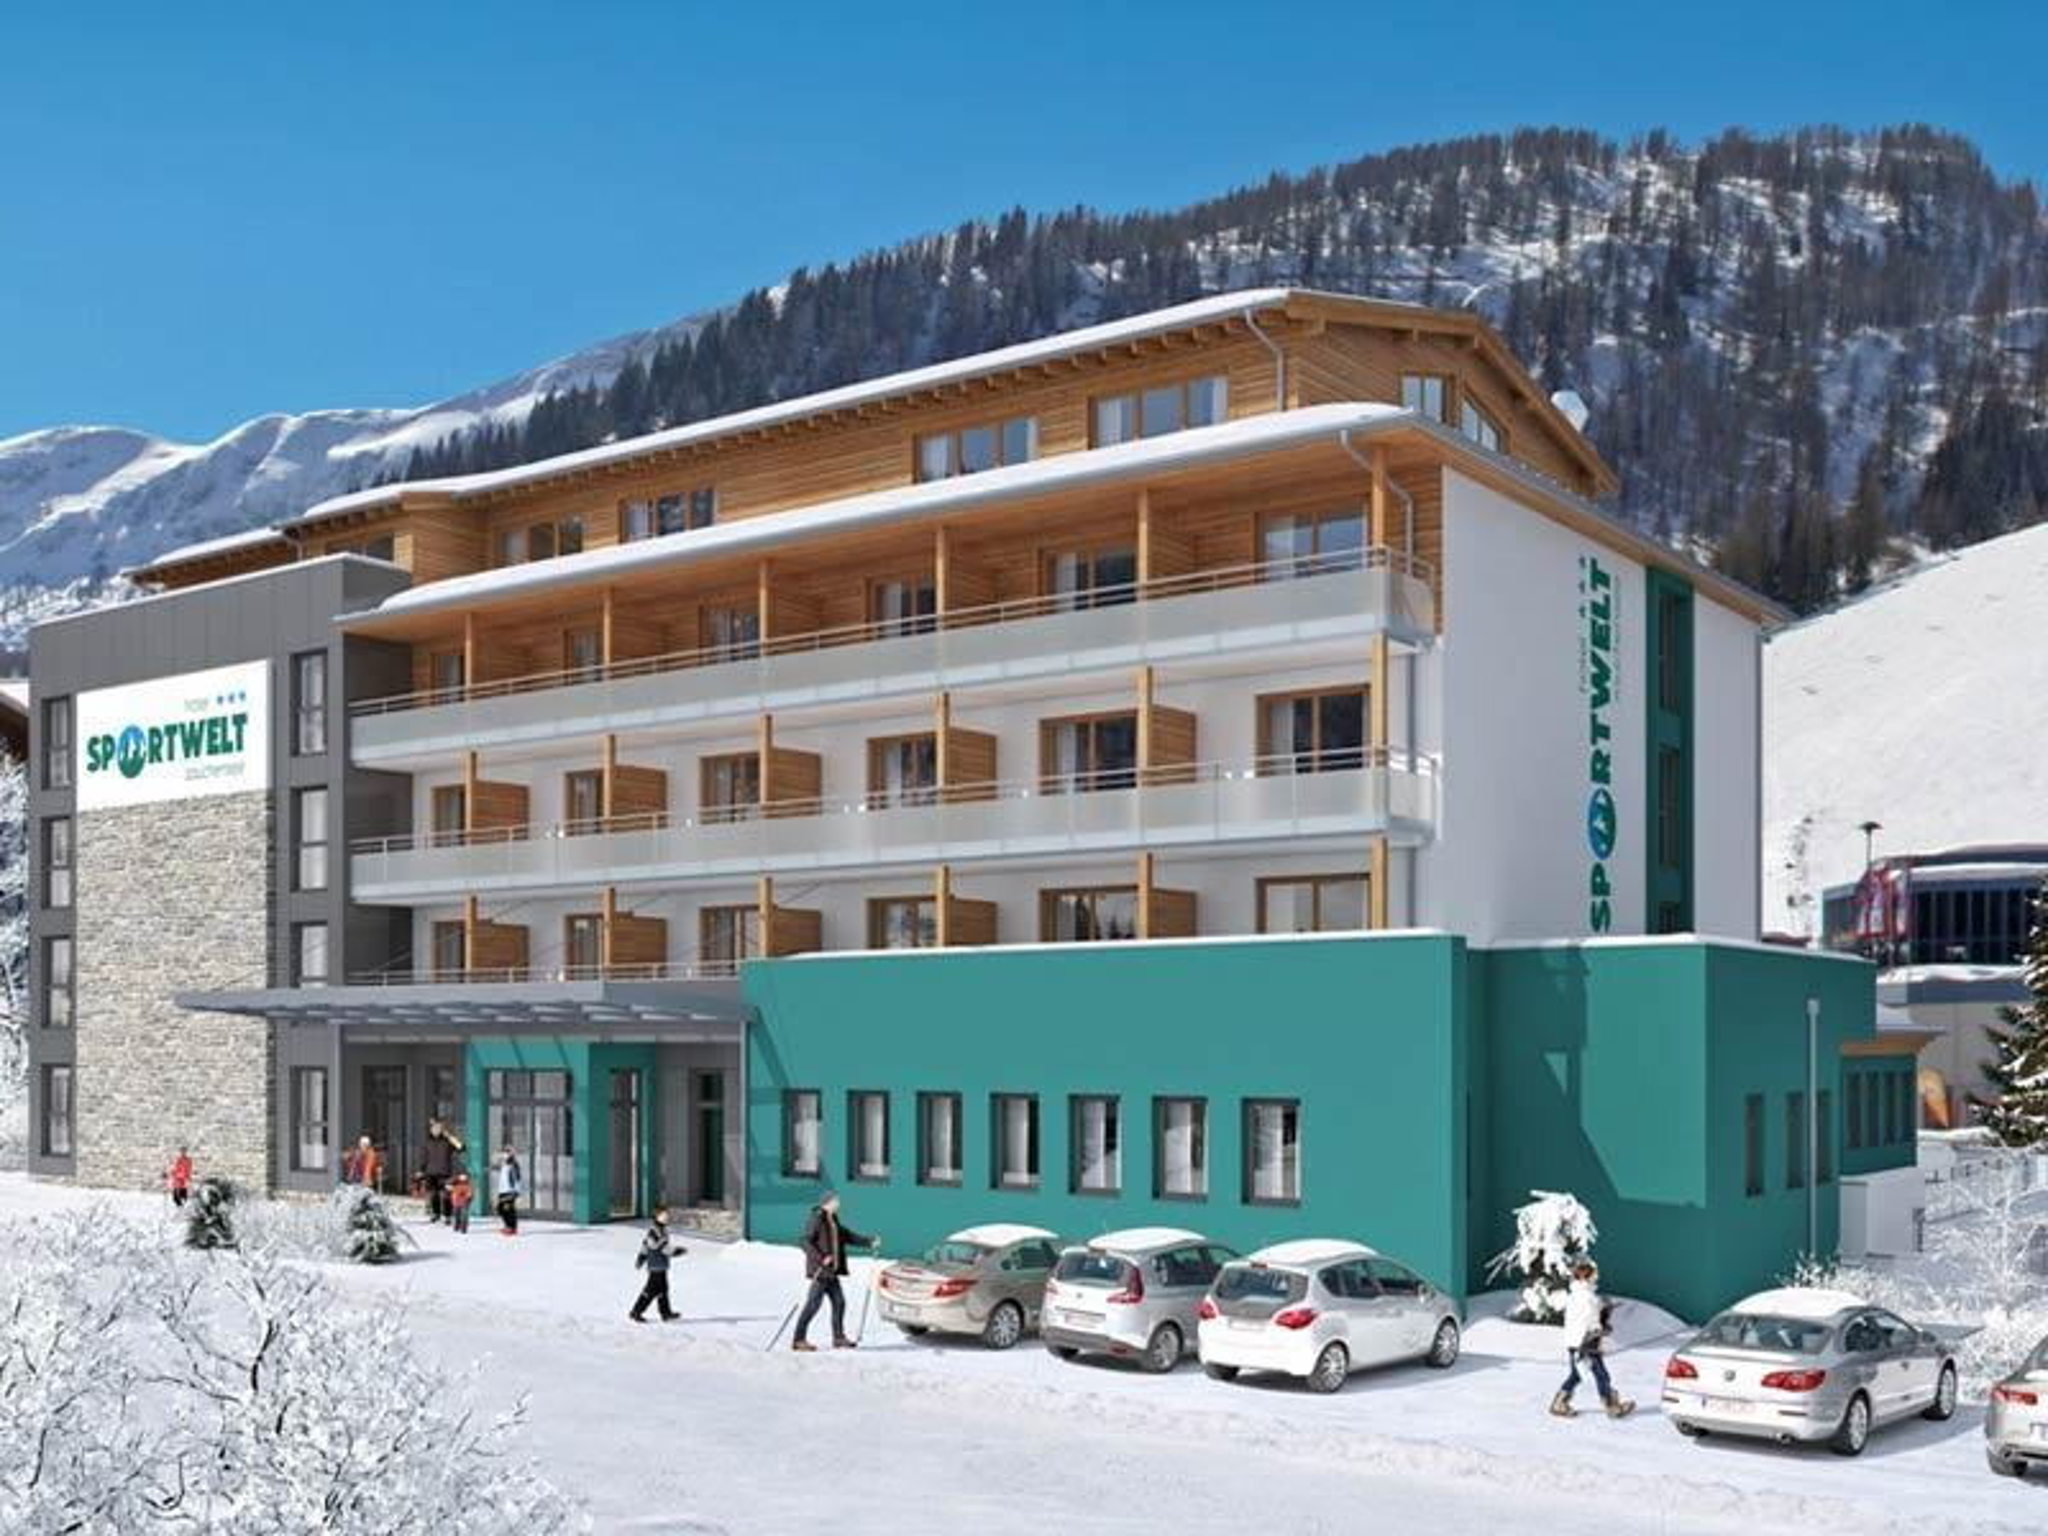 Hotel Sportwelt - Walchhofer